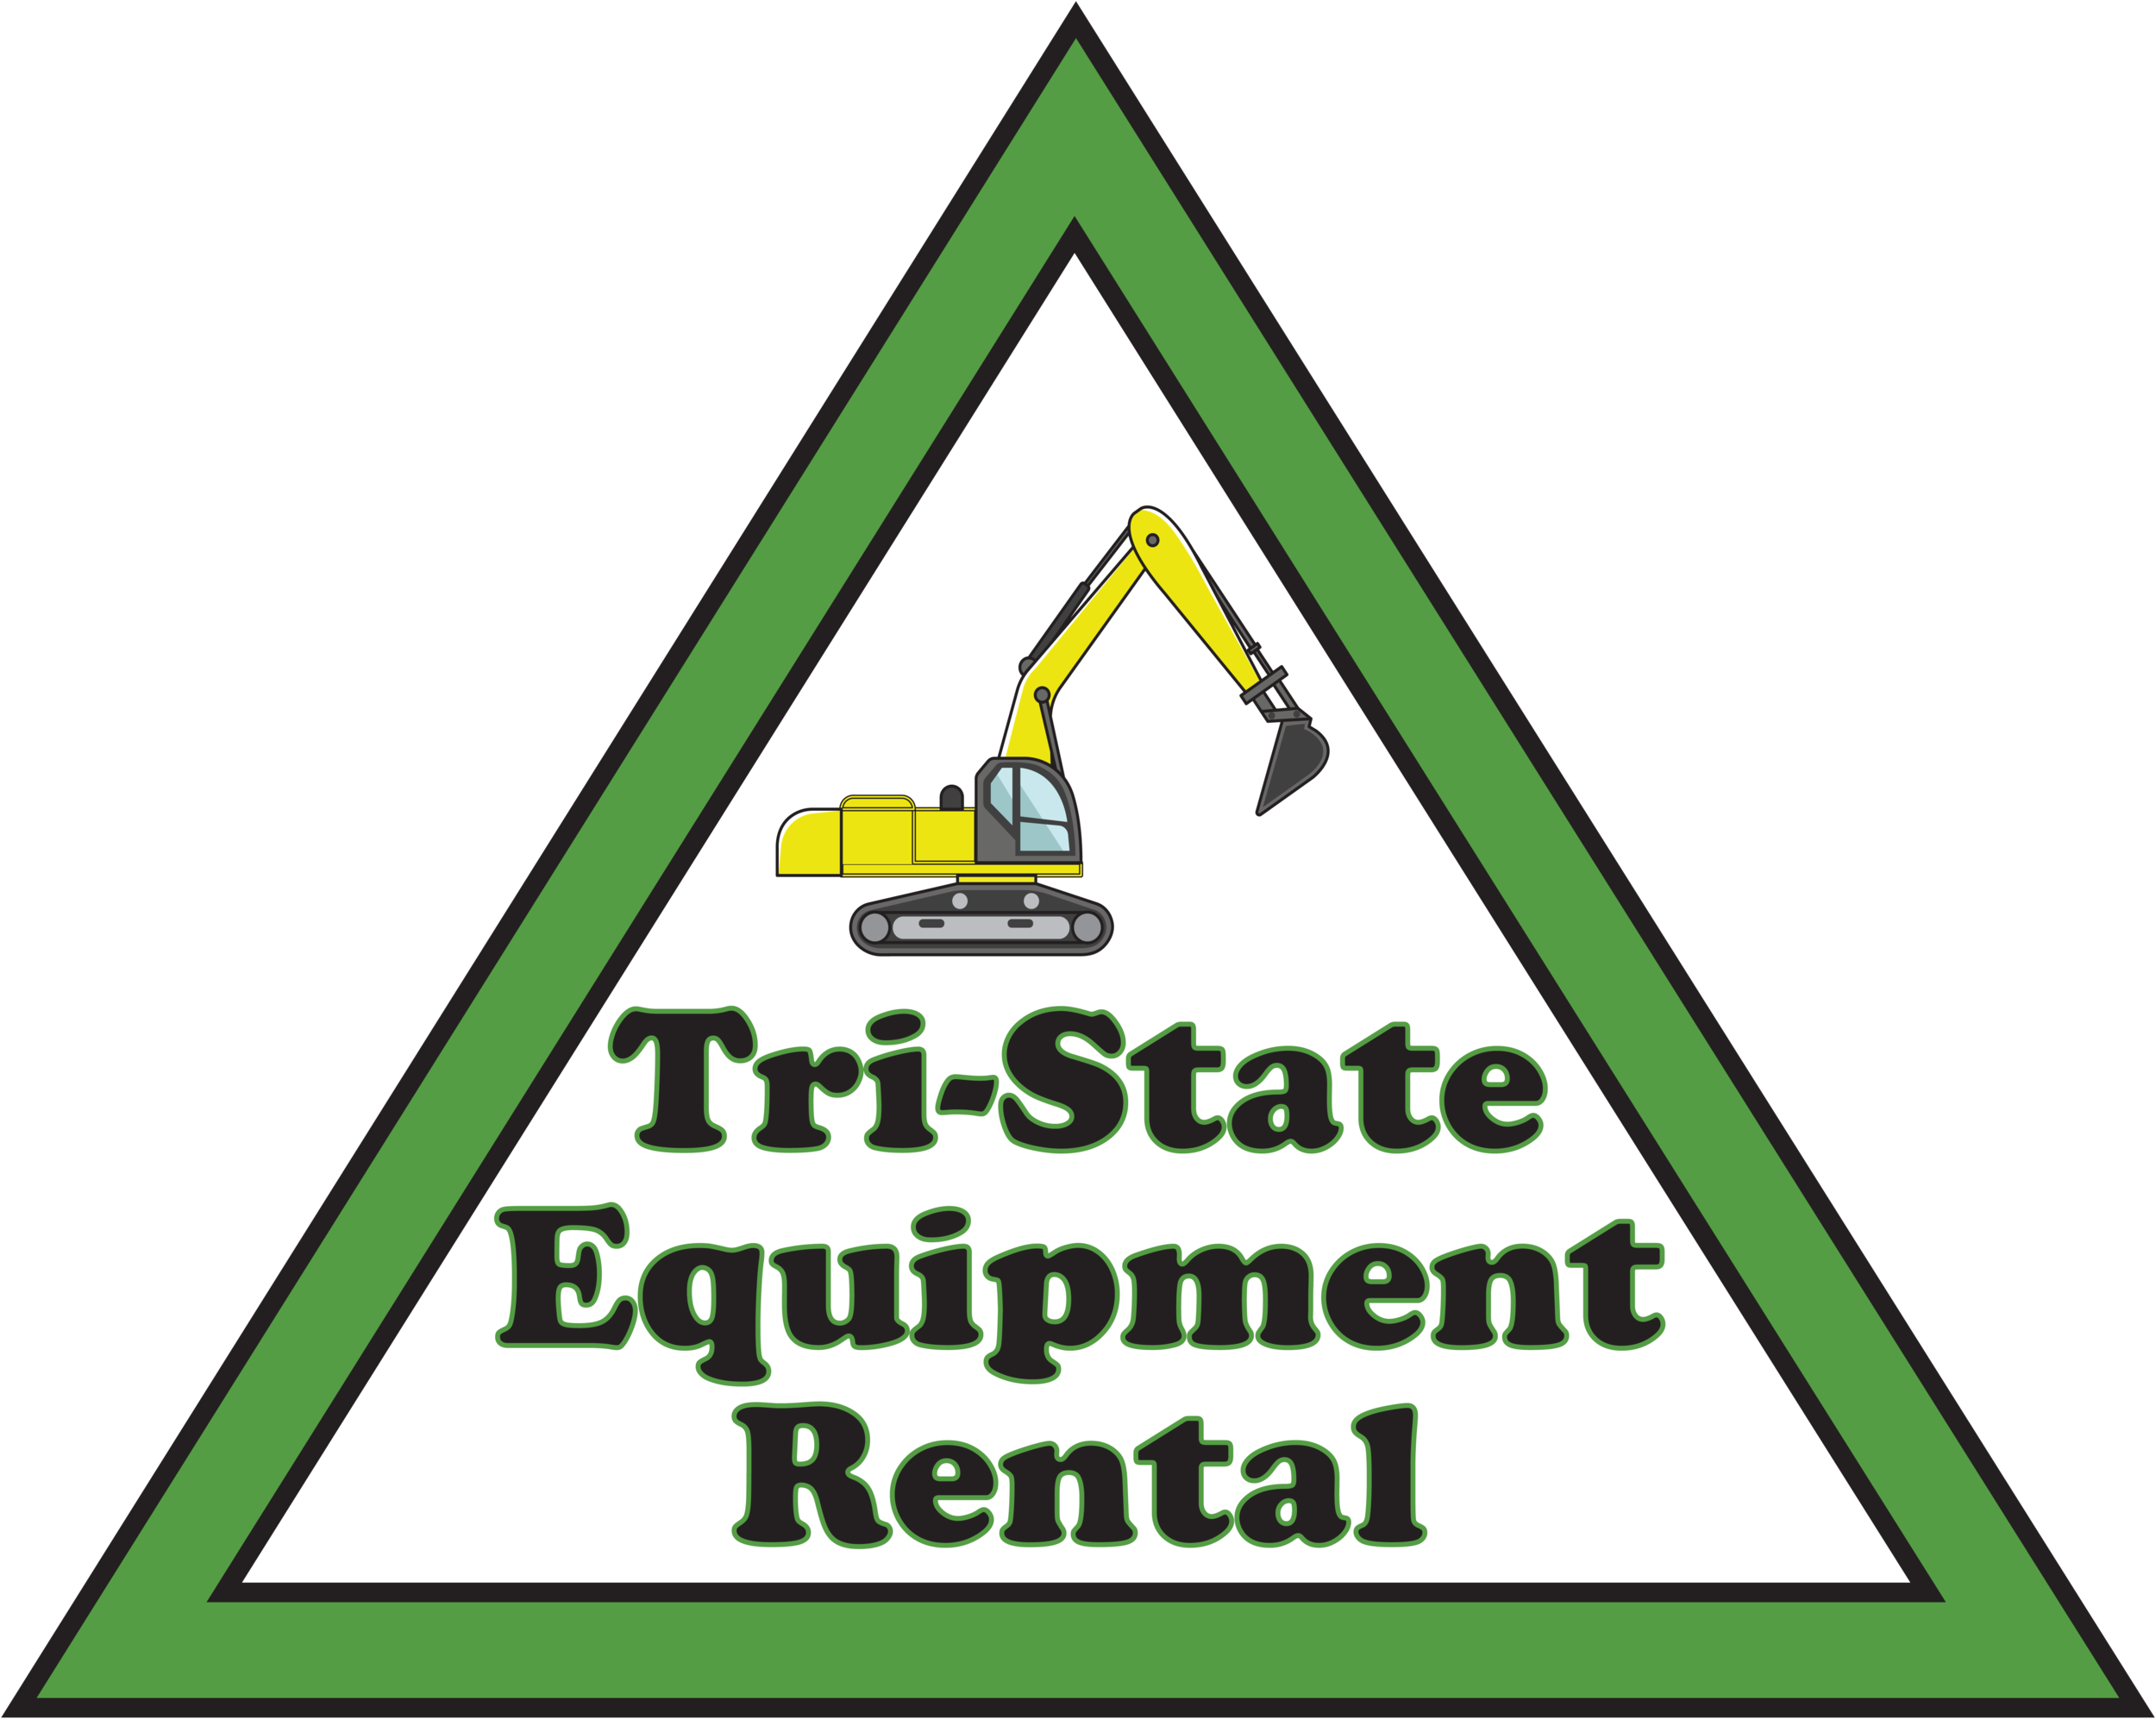 Tri-State Equipment Rental